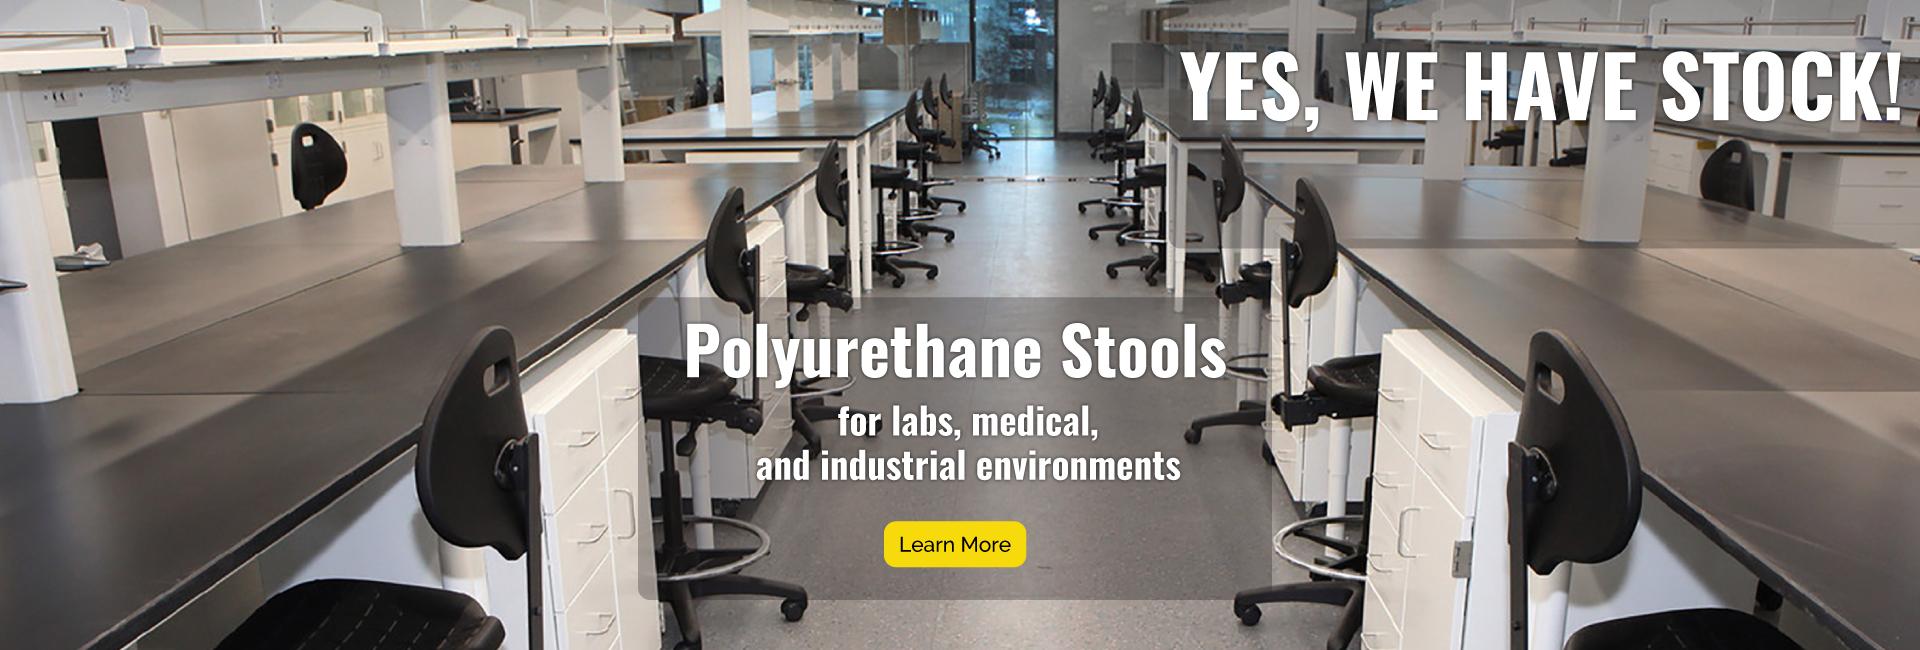 Polyurethane Industrial Stool In Stock